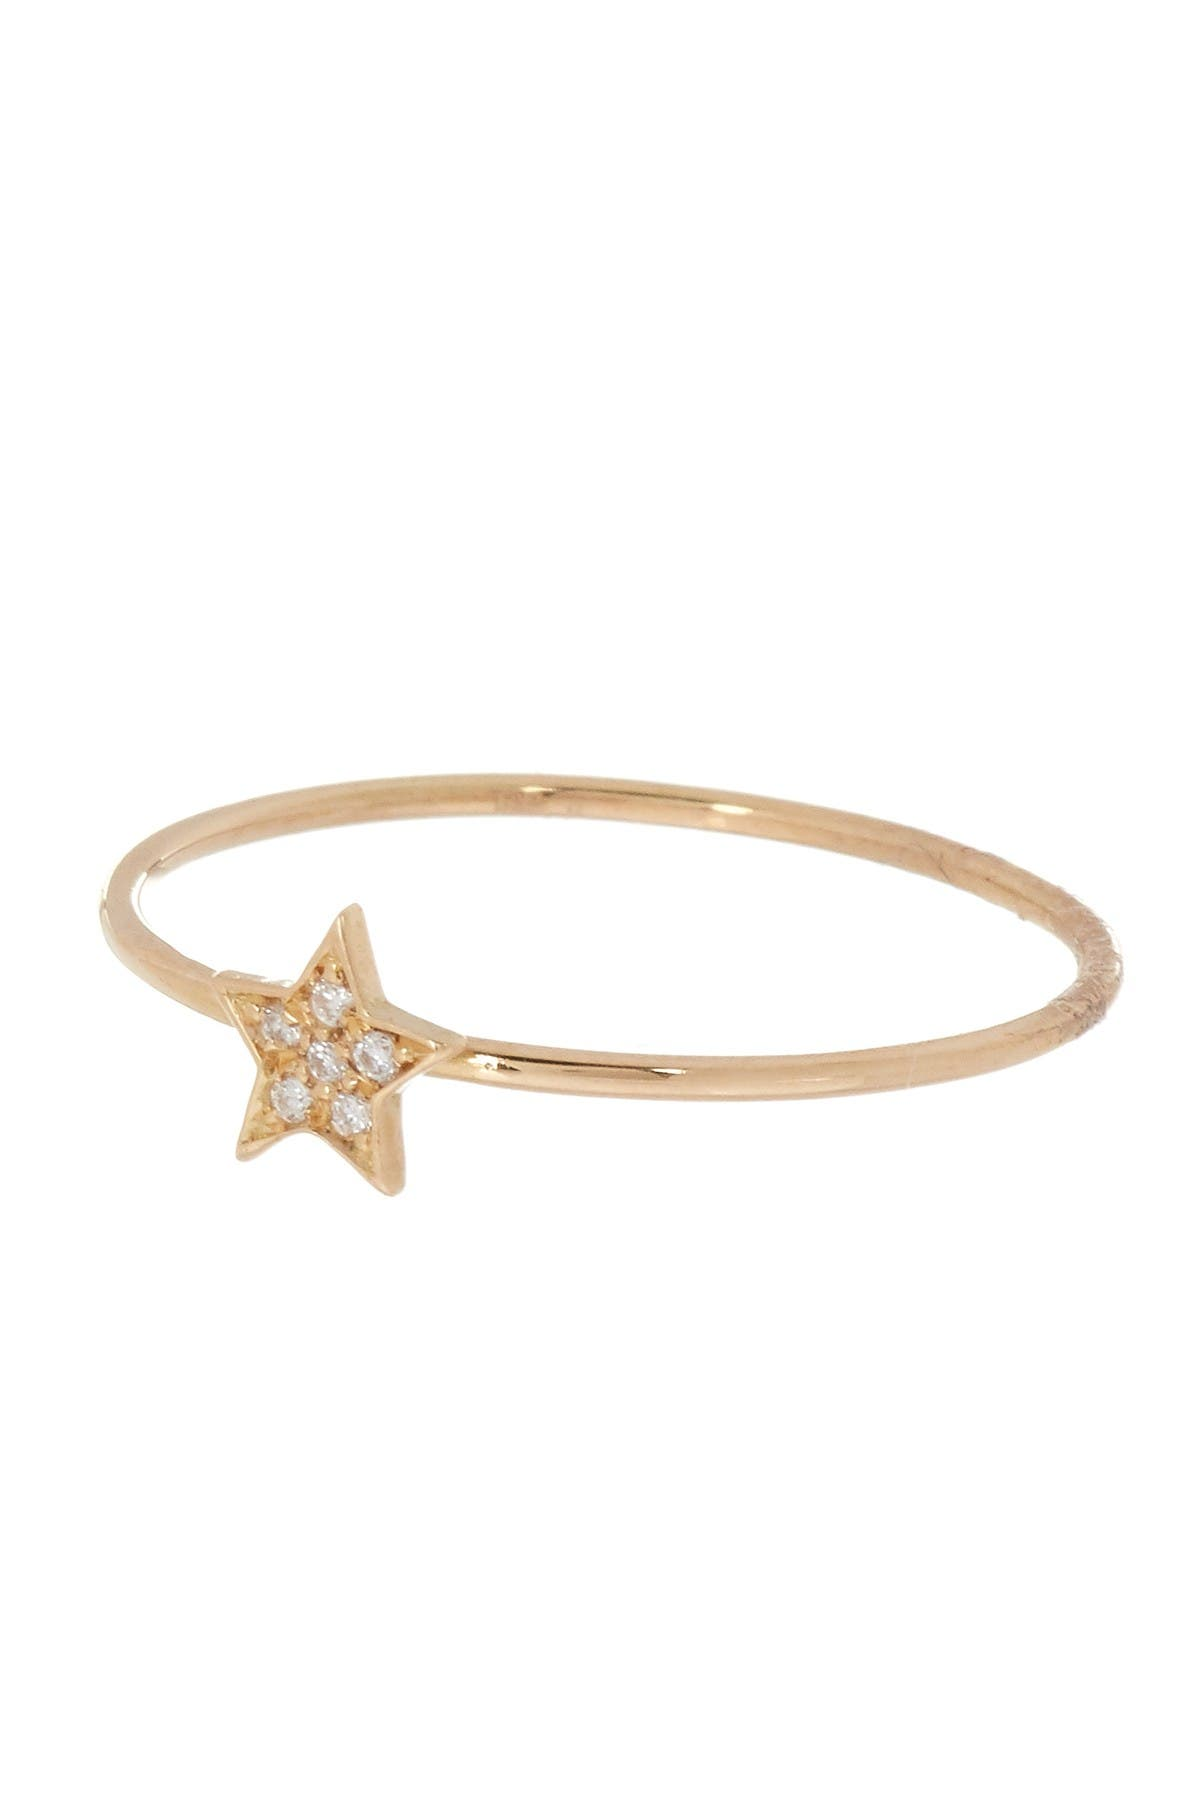 Image of Bony Levy 18K Yellow Gold Petite Star Diamond Ring - 0.02 ctw